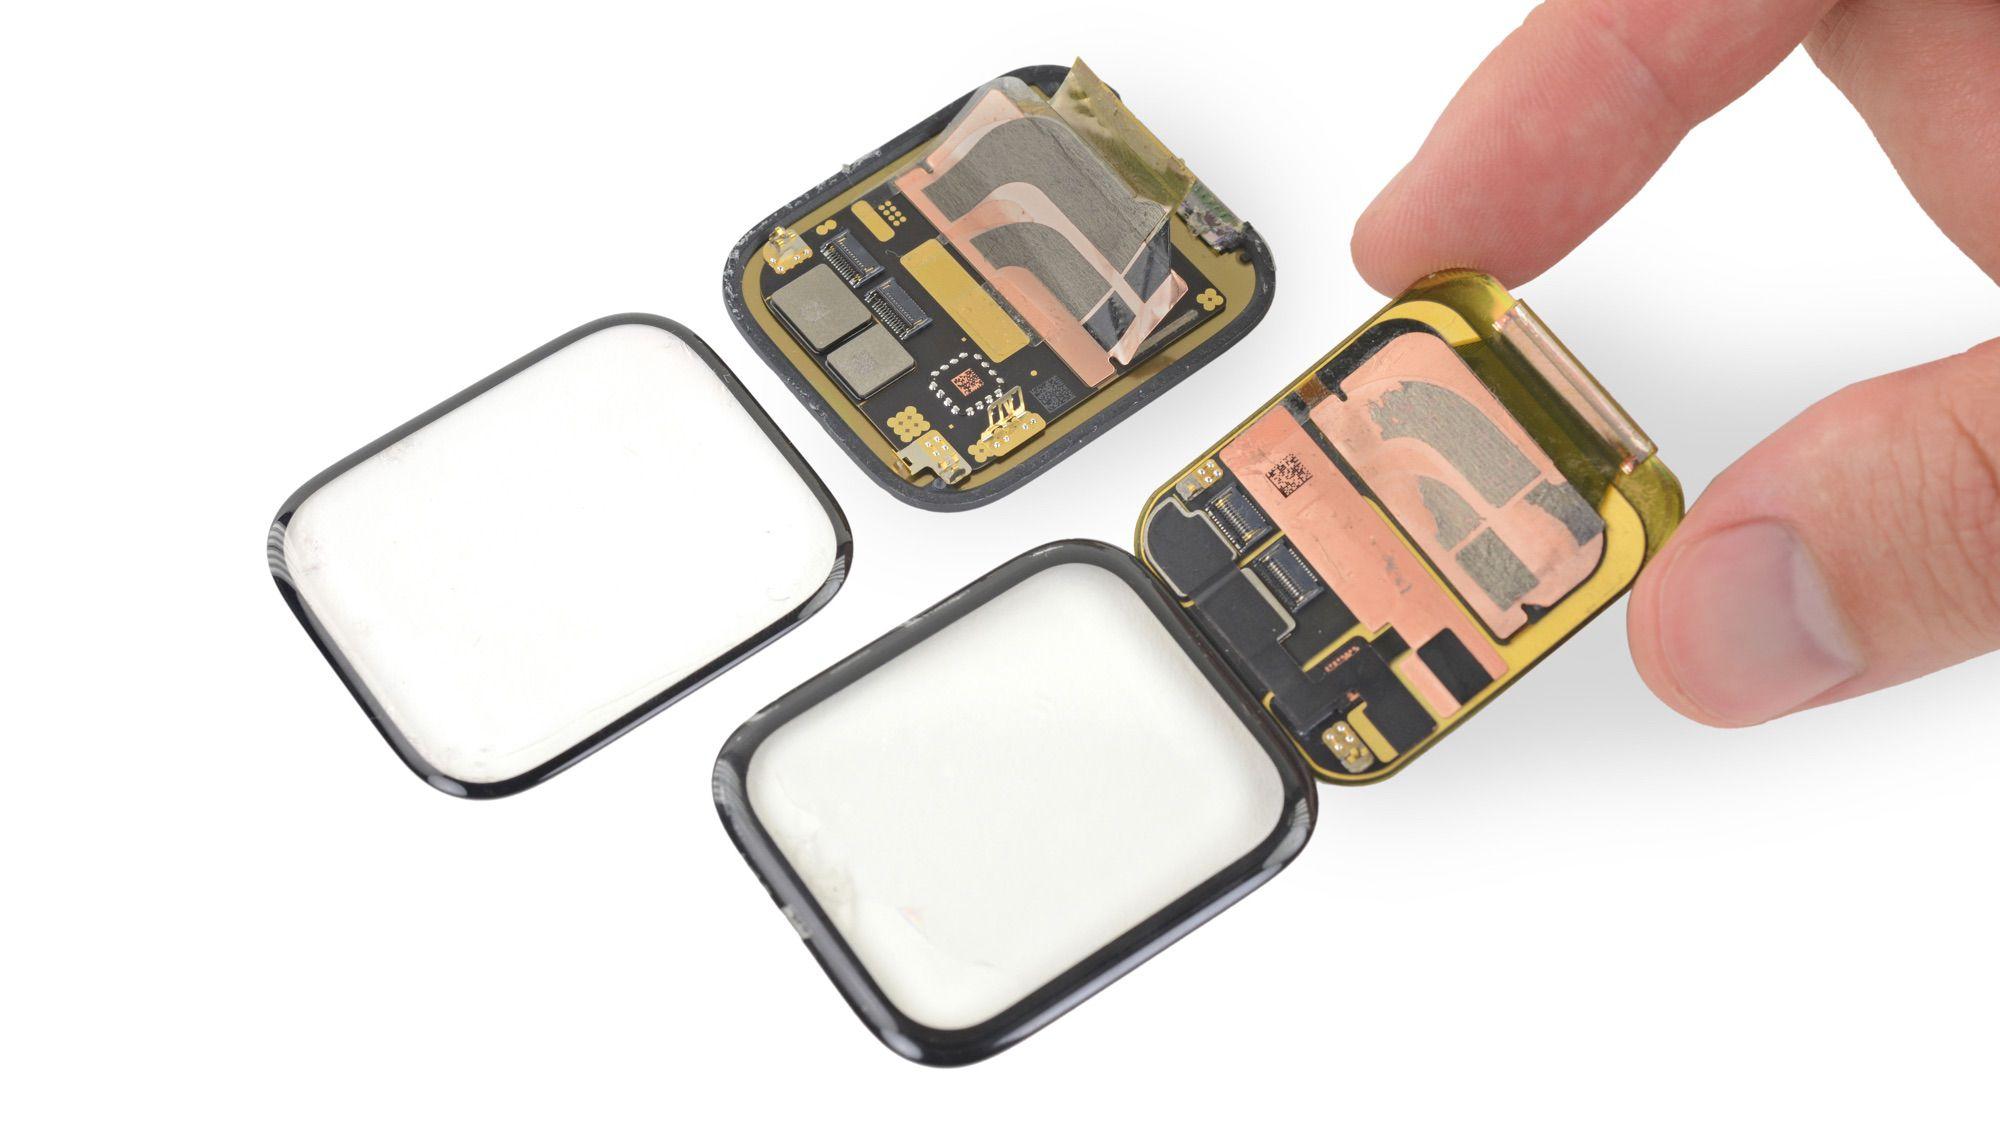 Apple Watch Series 7 Teardown Reveals Battery Capacity, Display Updates and More